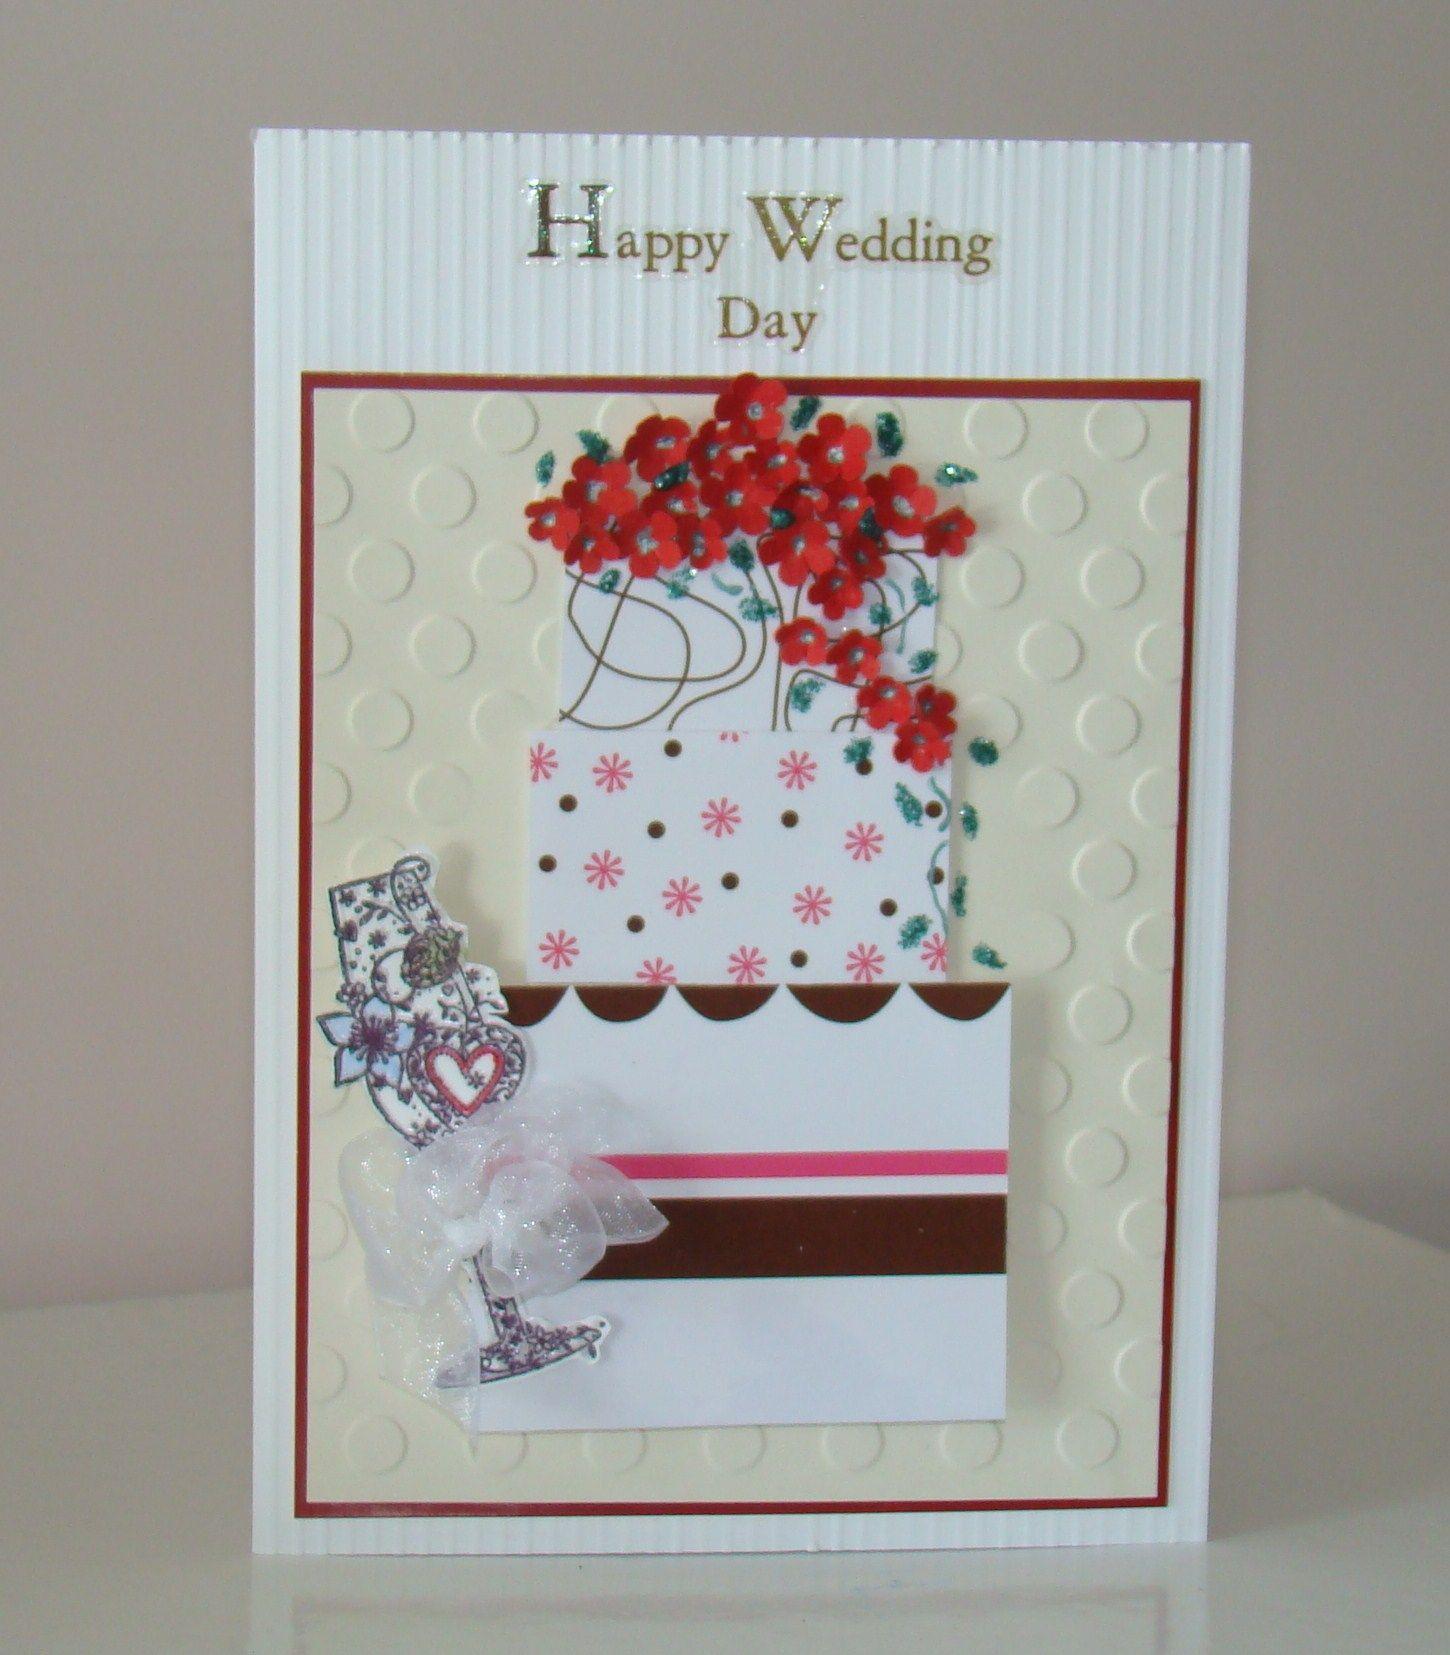 1 Year Wedding Anniversary Gifts Pinterest : Wedding card Wedding/anniversary cards Pinterest